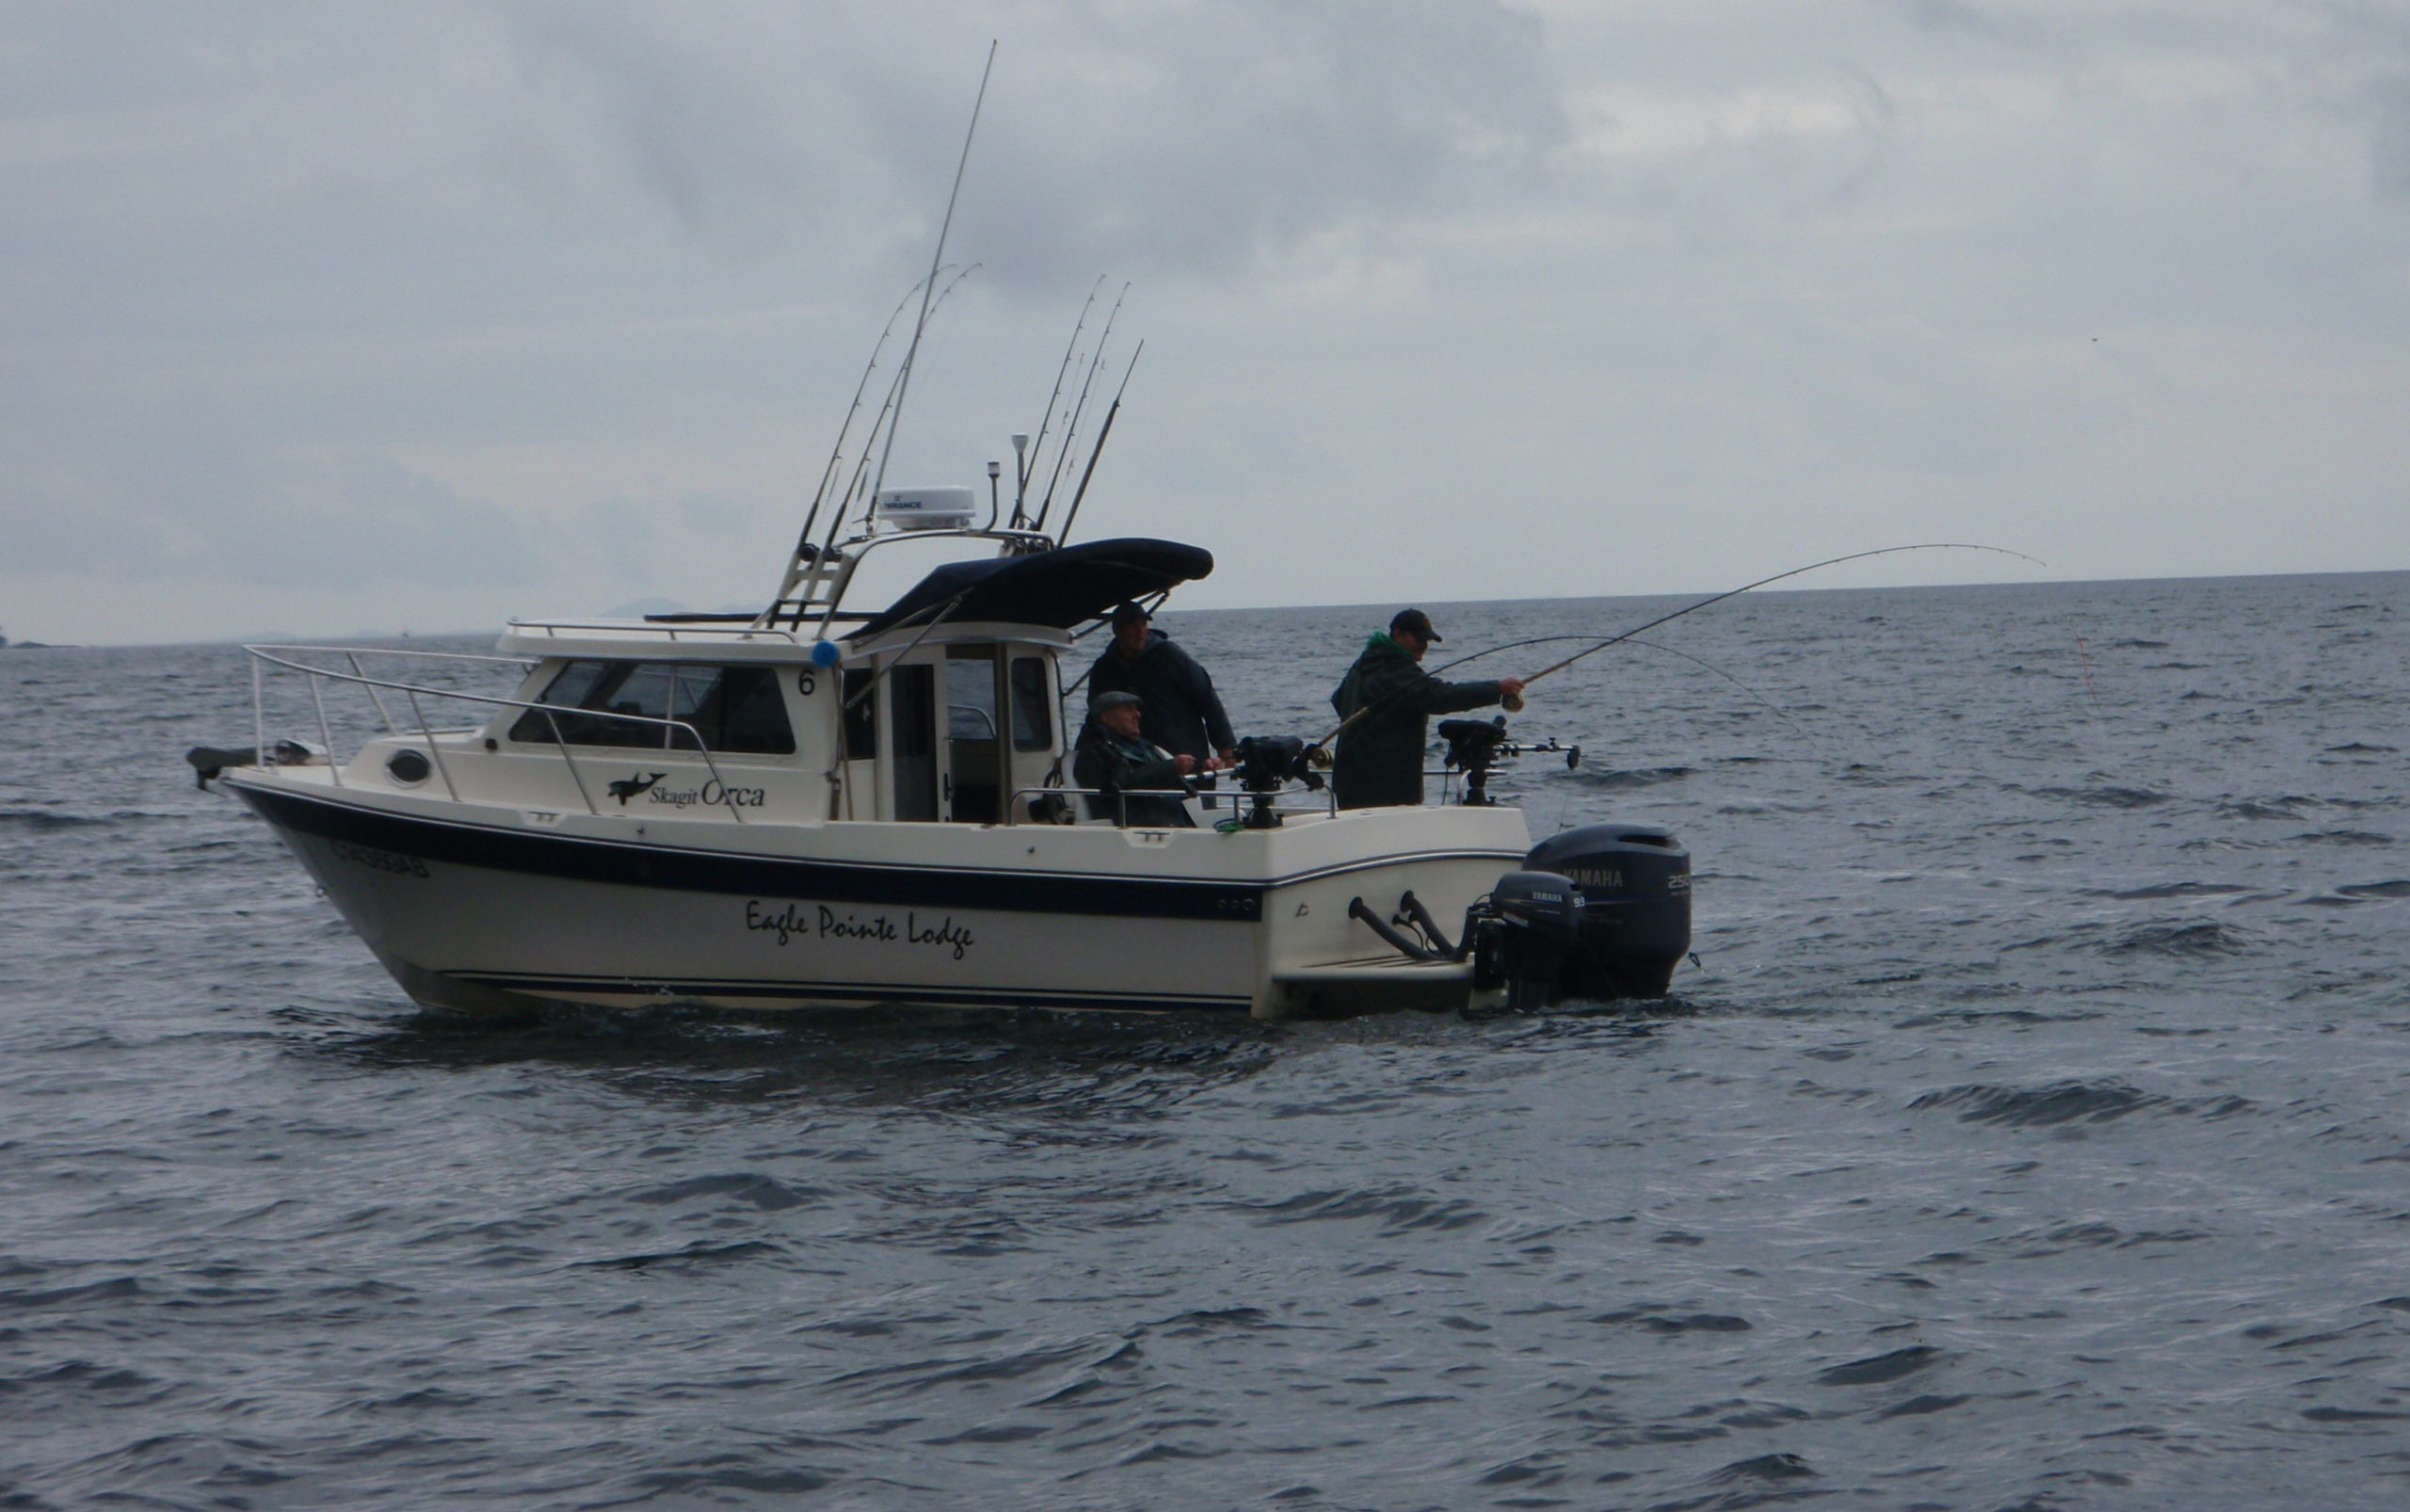 Vessel Safety Equipment